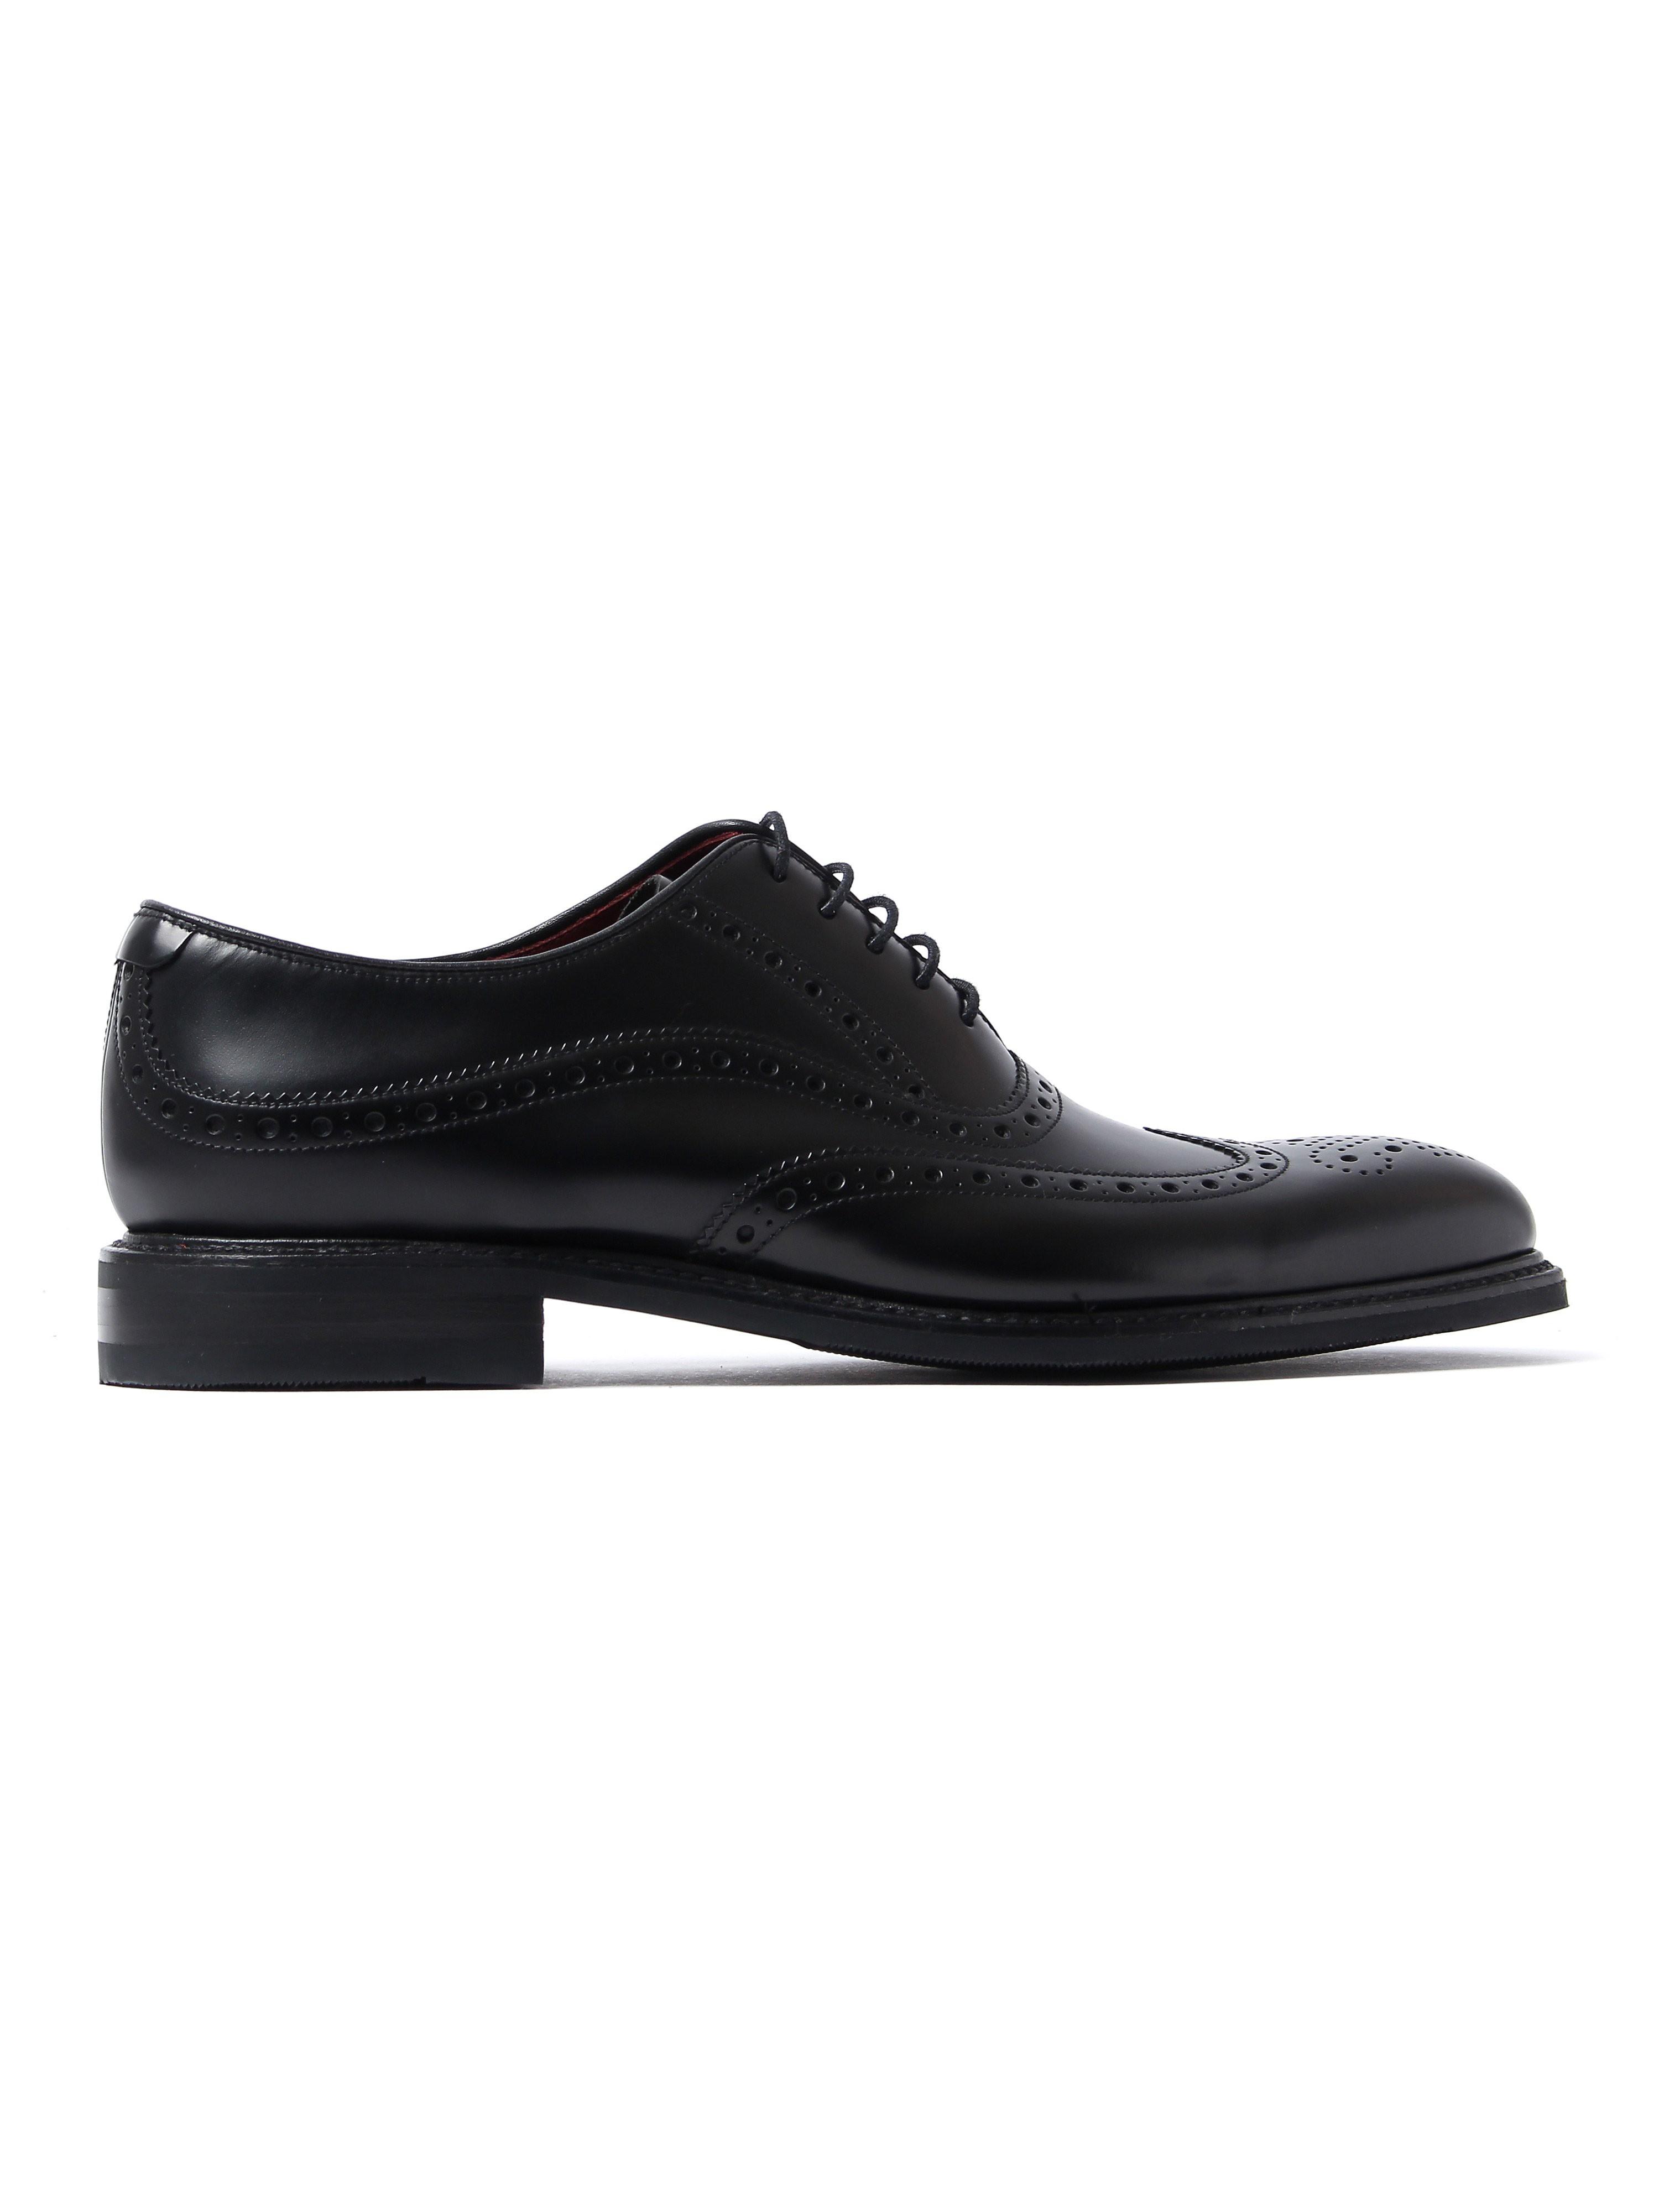 Loake Men's Demon Shadow Brogue Shoes - Black